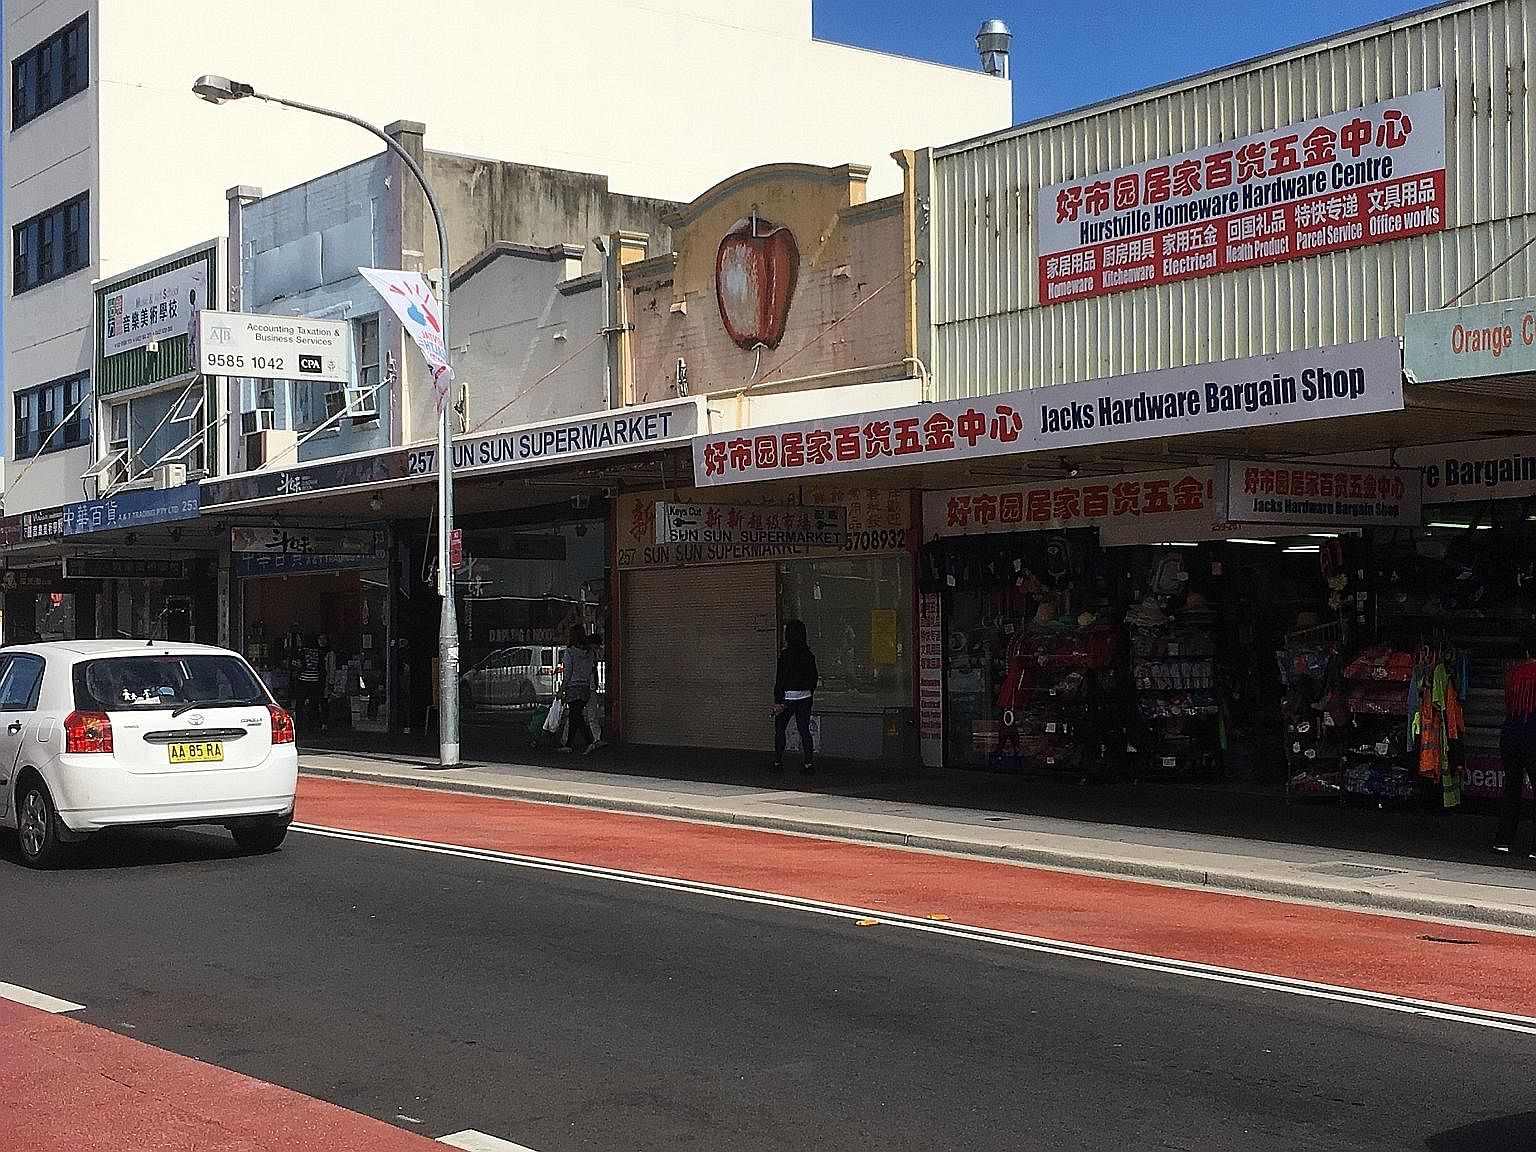 Asian immigrants altering Aussie suburbs, Australia/NZ News & Top